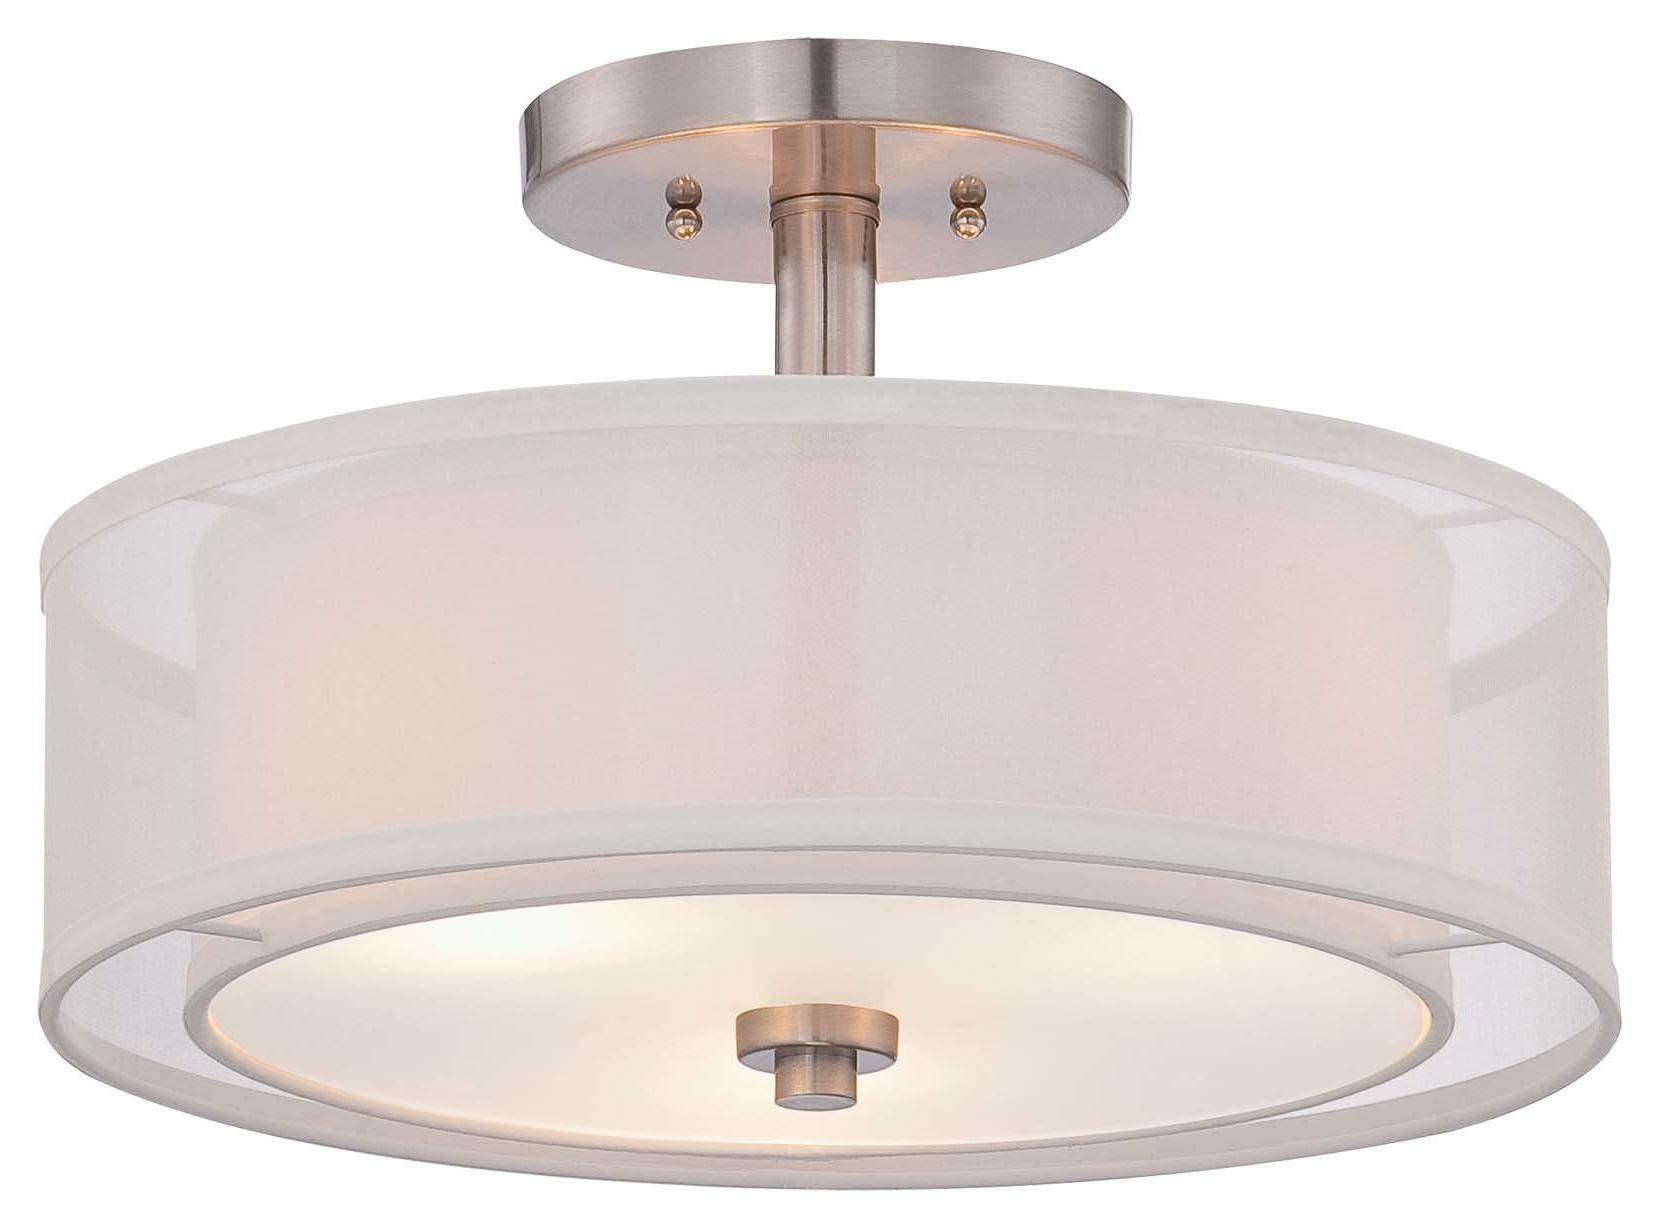 Demby 3 Light Semi Flush Mount Inside 2020 Radtke 3 Light Single Drum Pendants (Gallery 18 of 25)